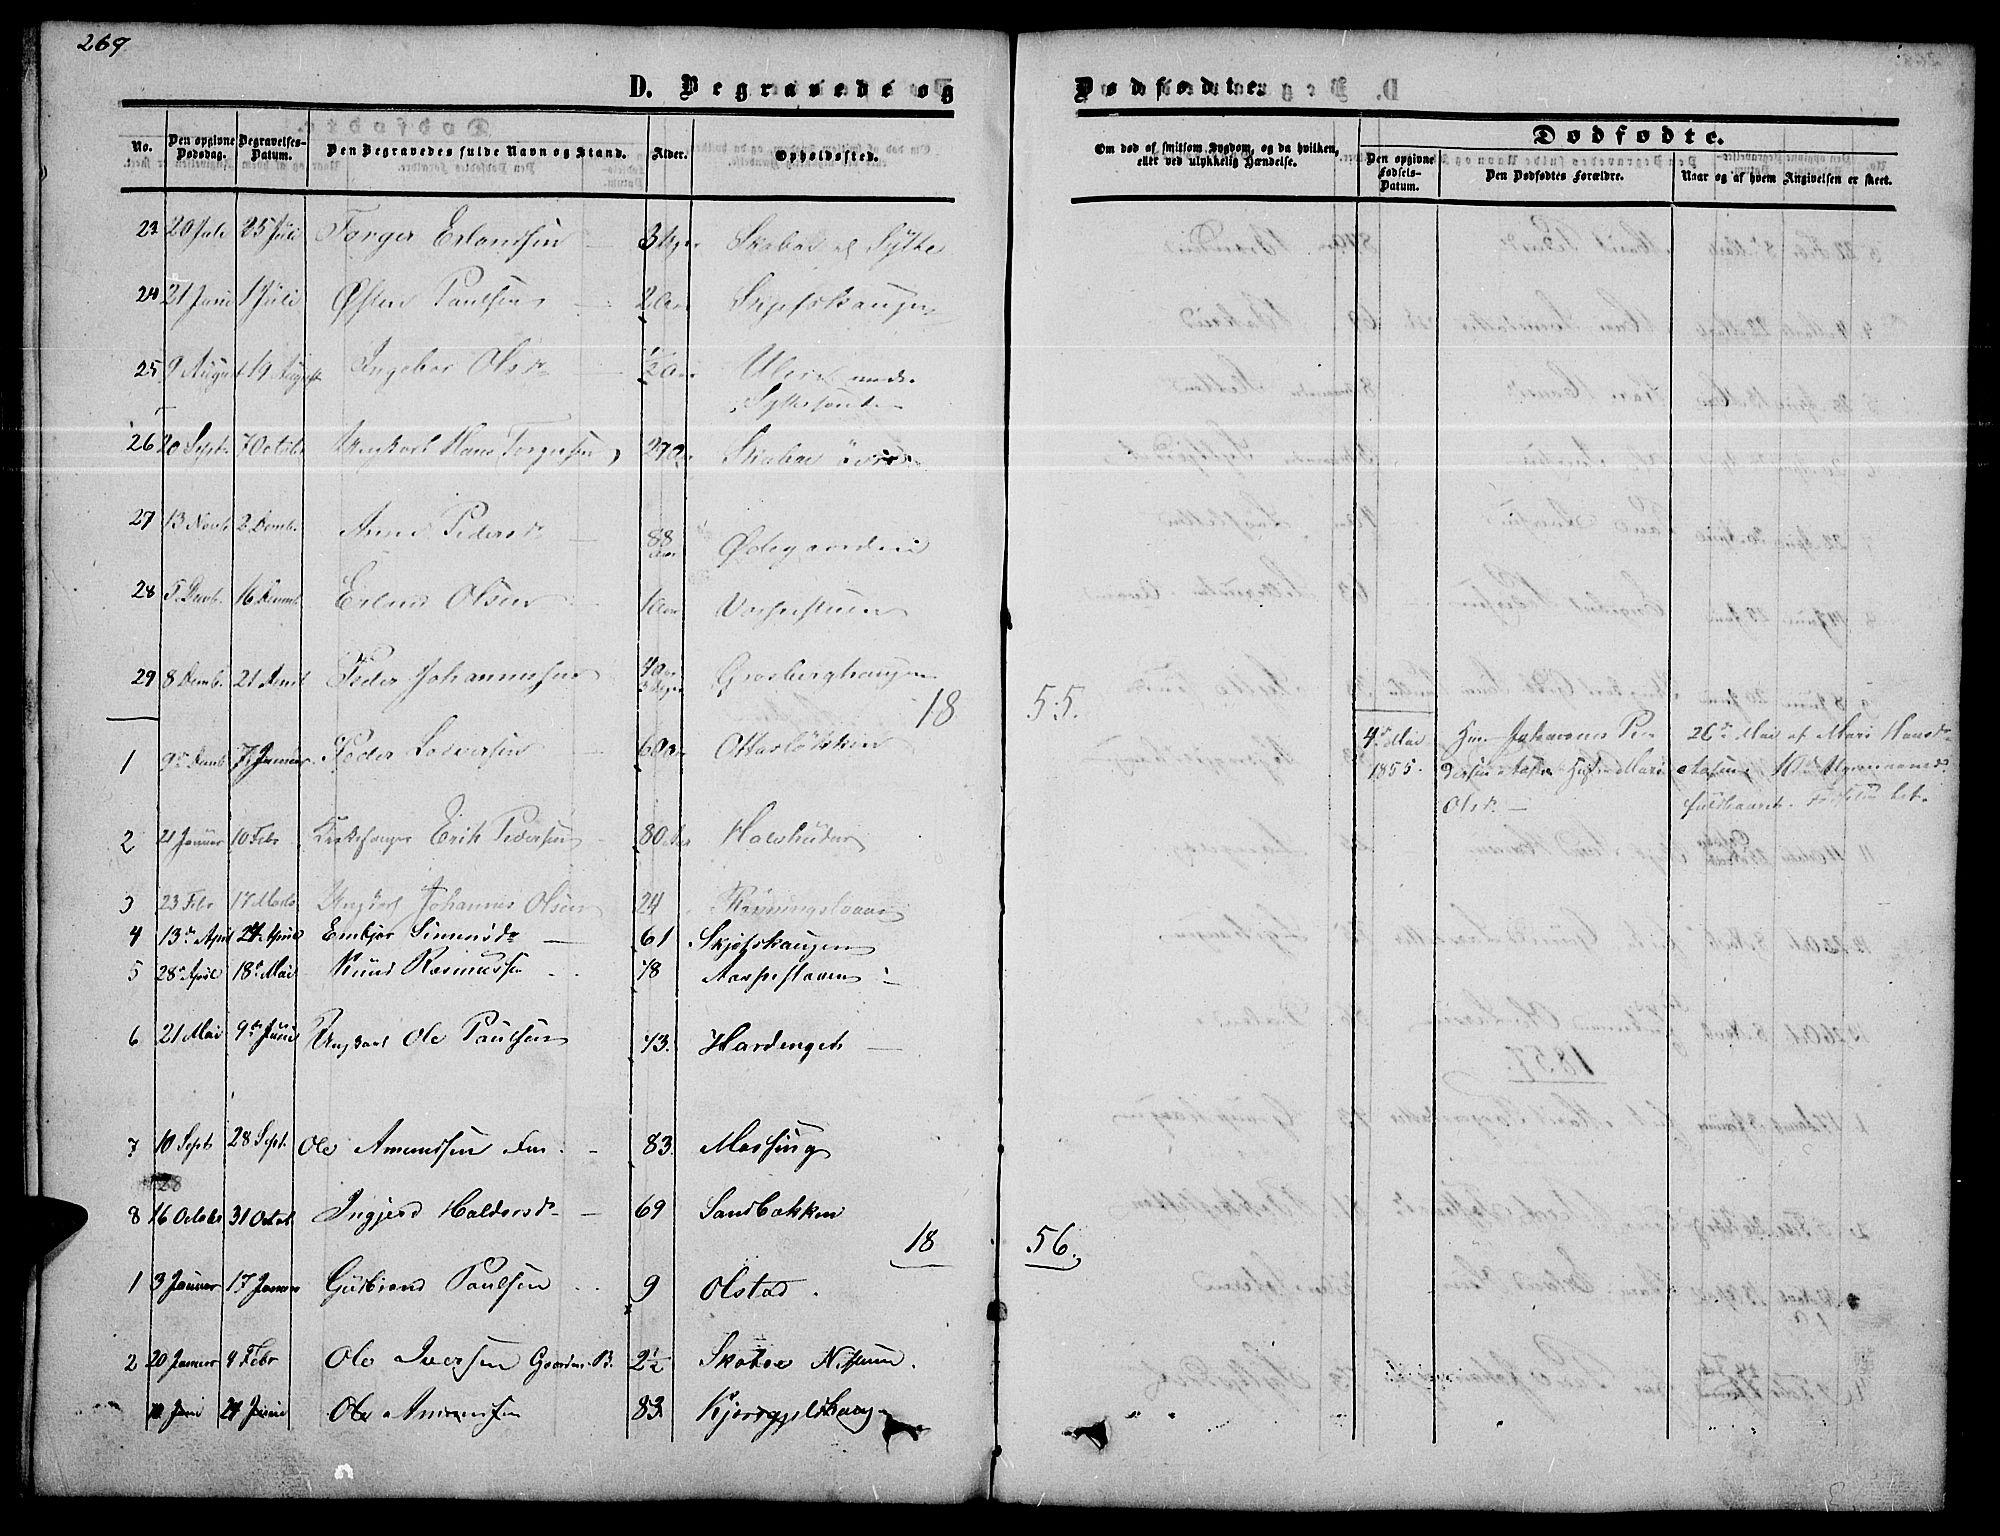 SAH, Nord-Fron prestekontor, Klokkerbok nr. 2, 1851-1883, s. 267